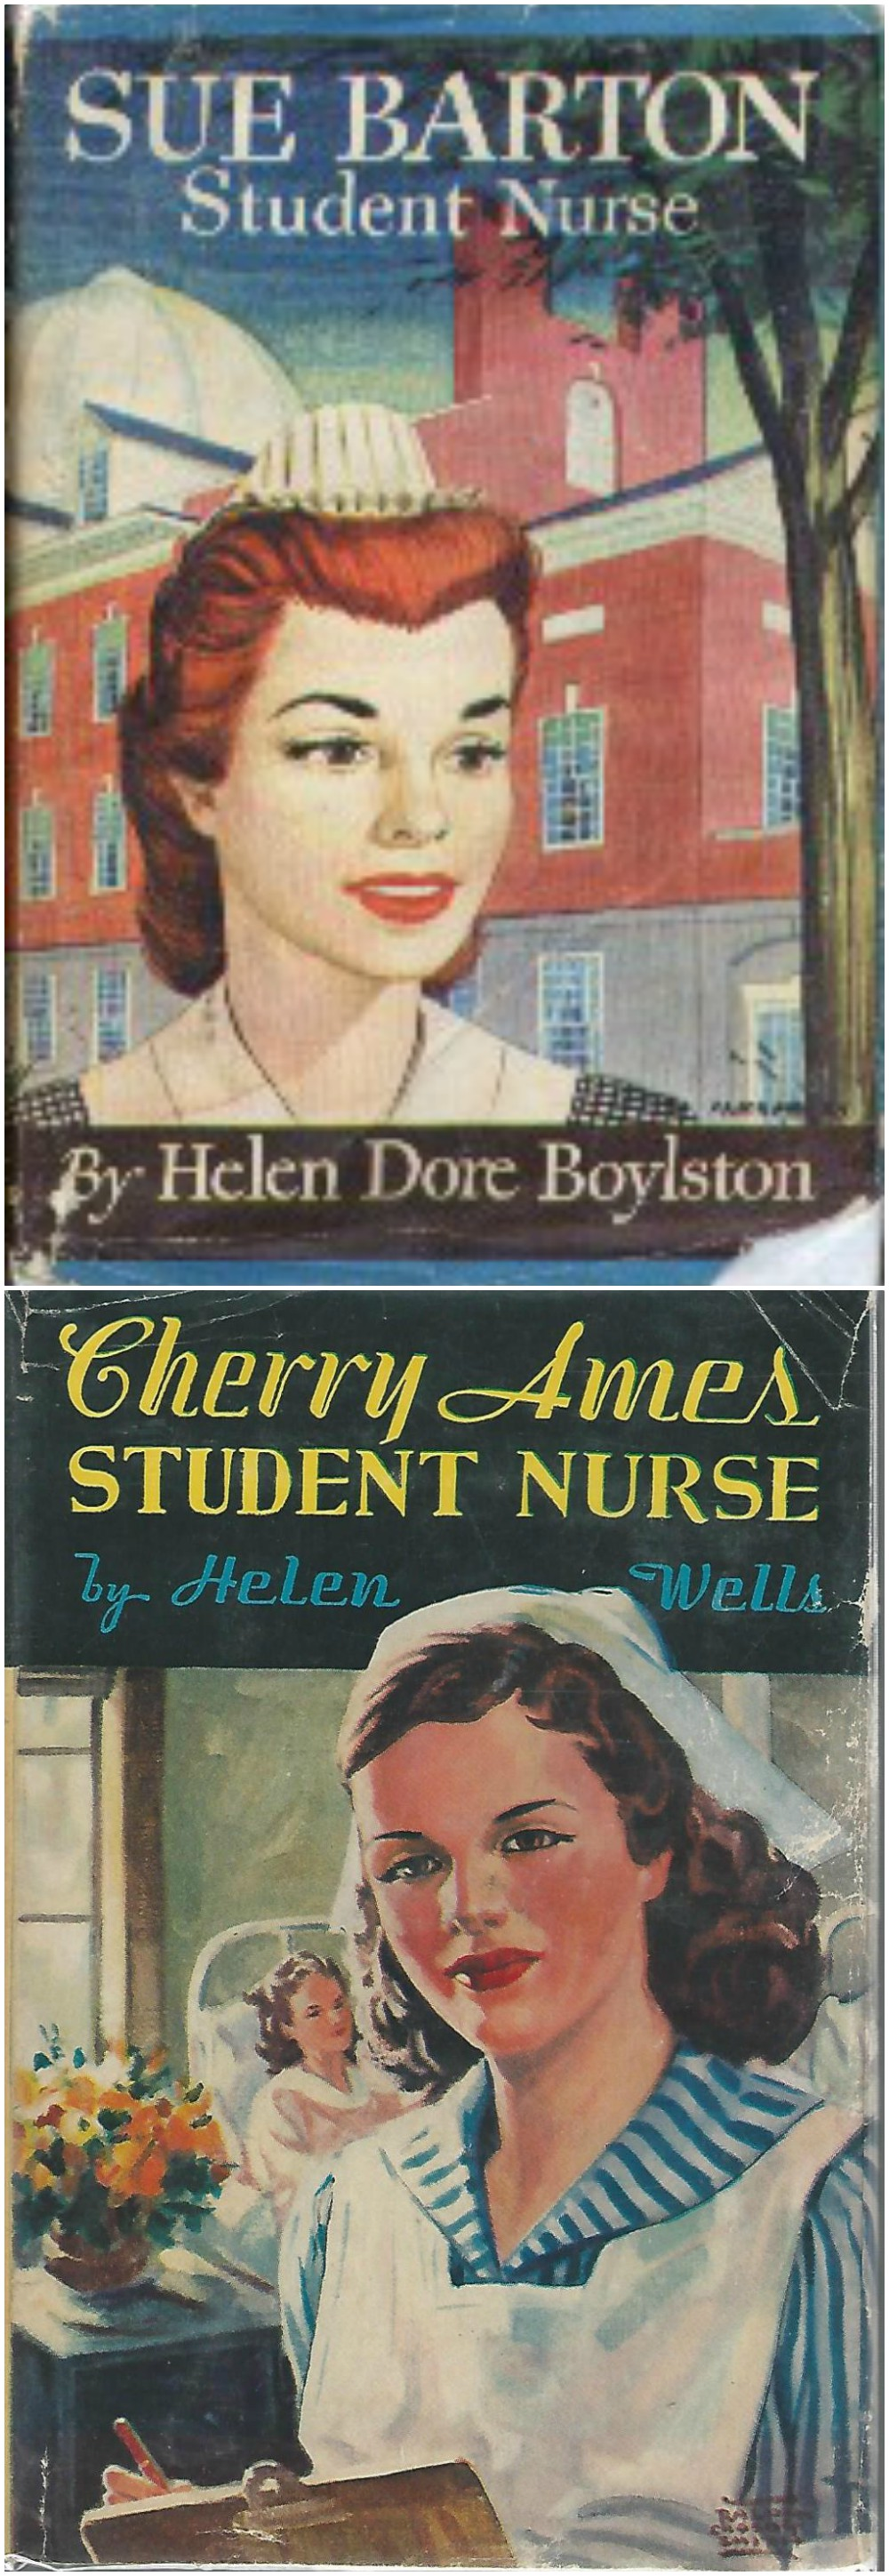 ipiccy nurse